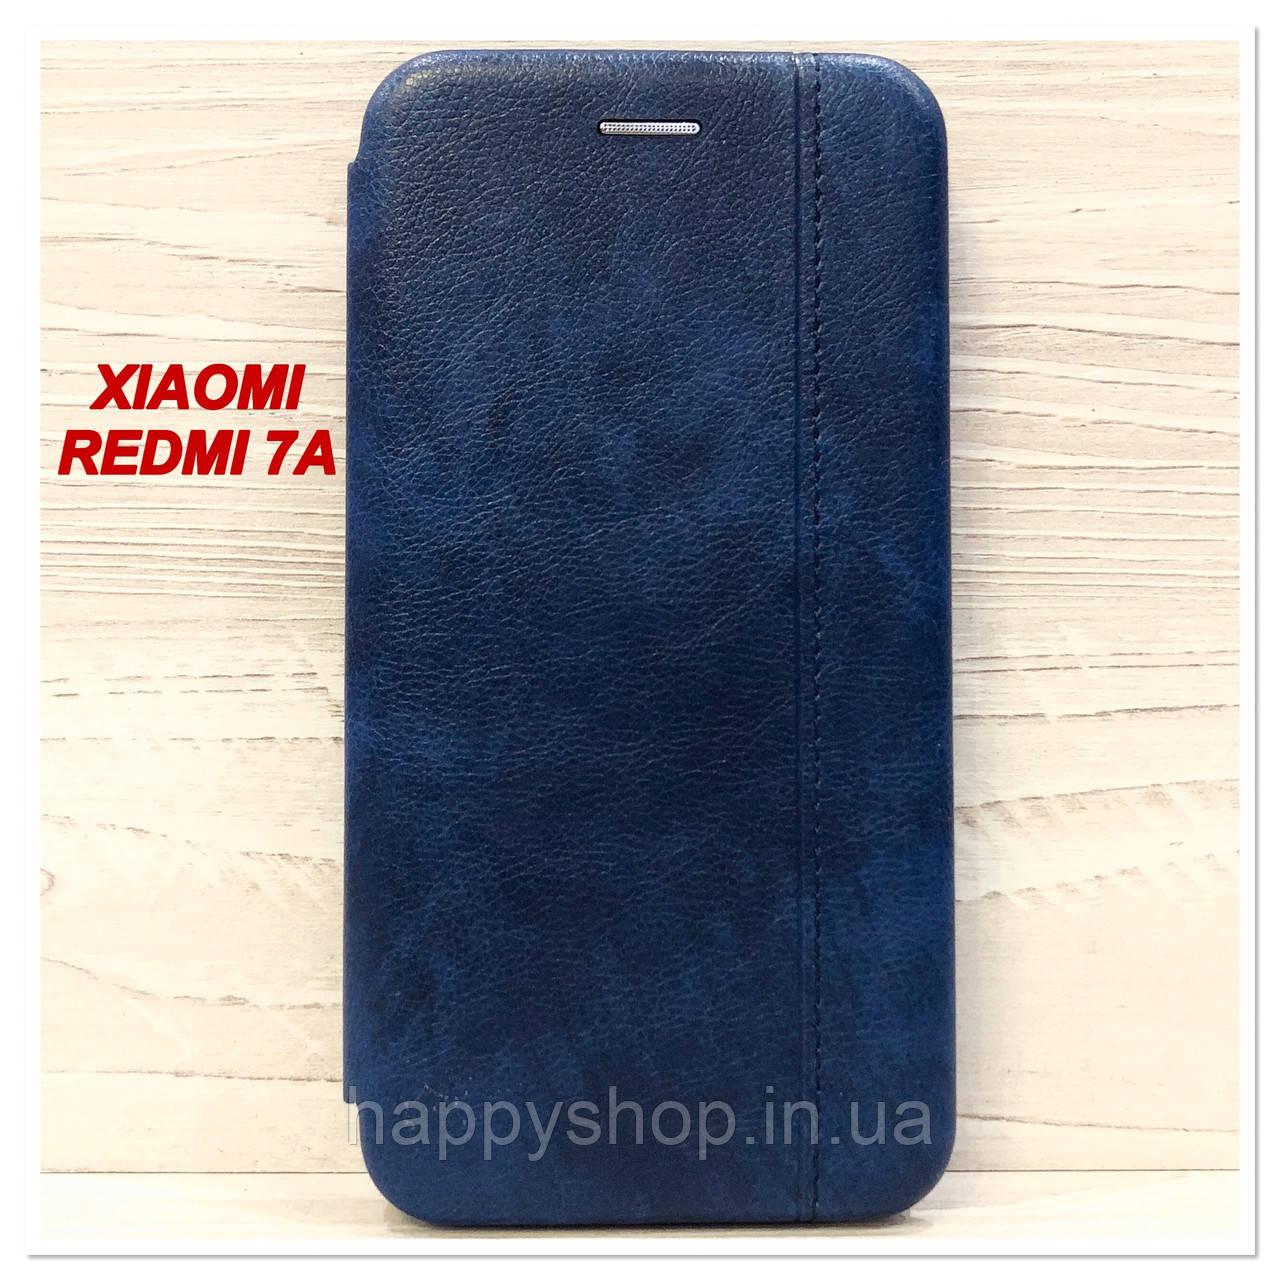 Чехол-книжка Gelius Leather для Xiaomi Redmi 7a (Синий)